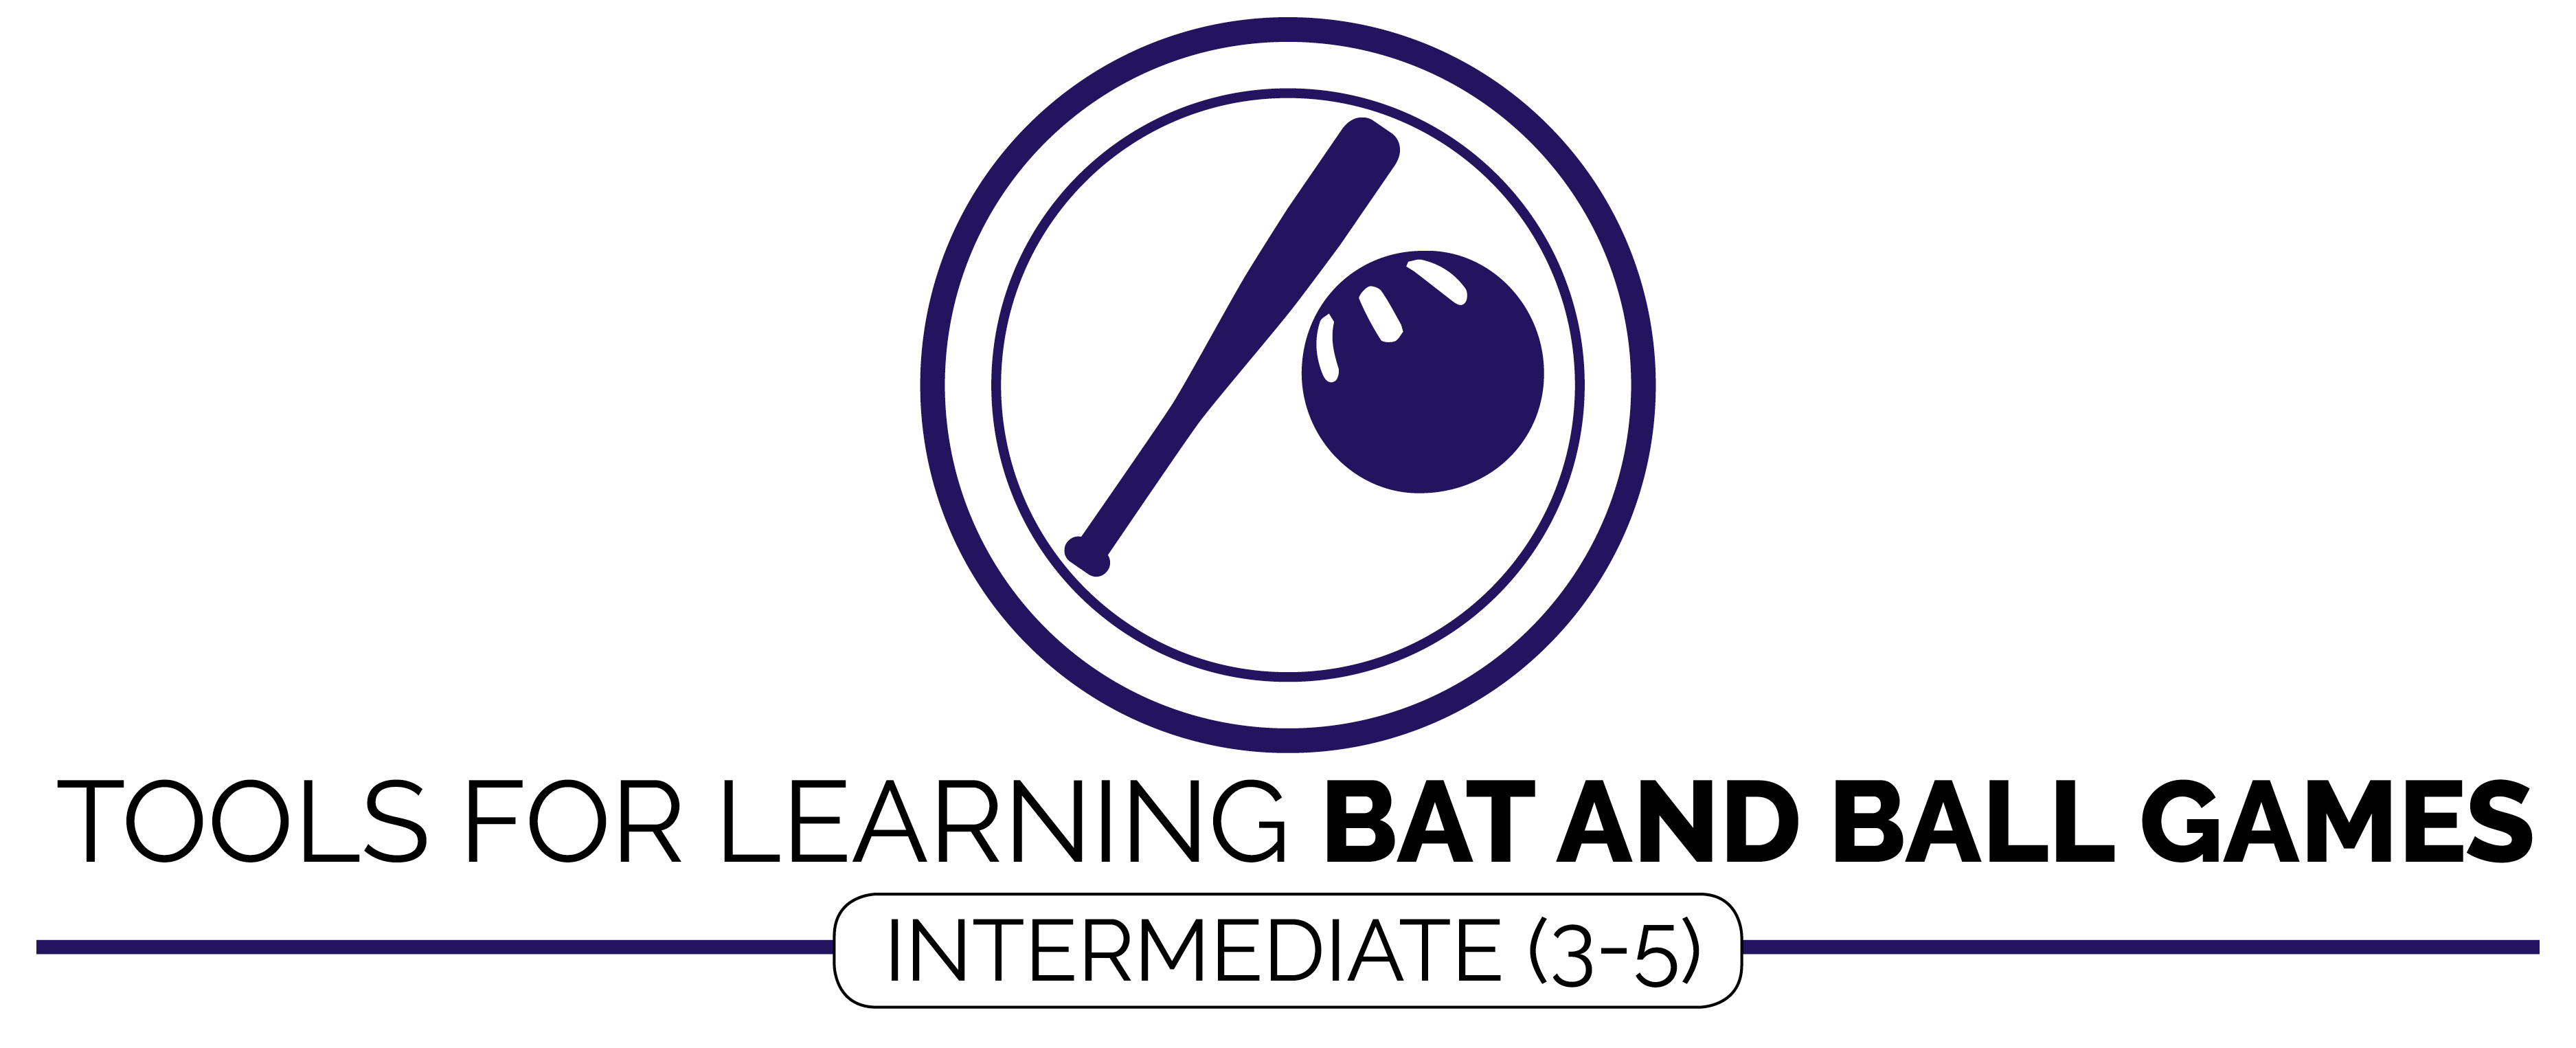 Bat and Ball Games(Intermediate 3-5)